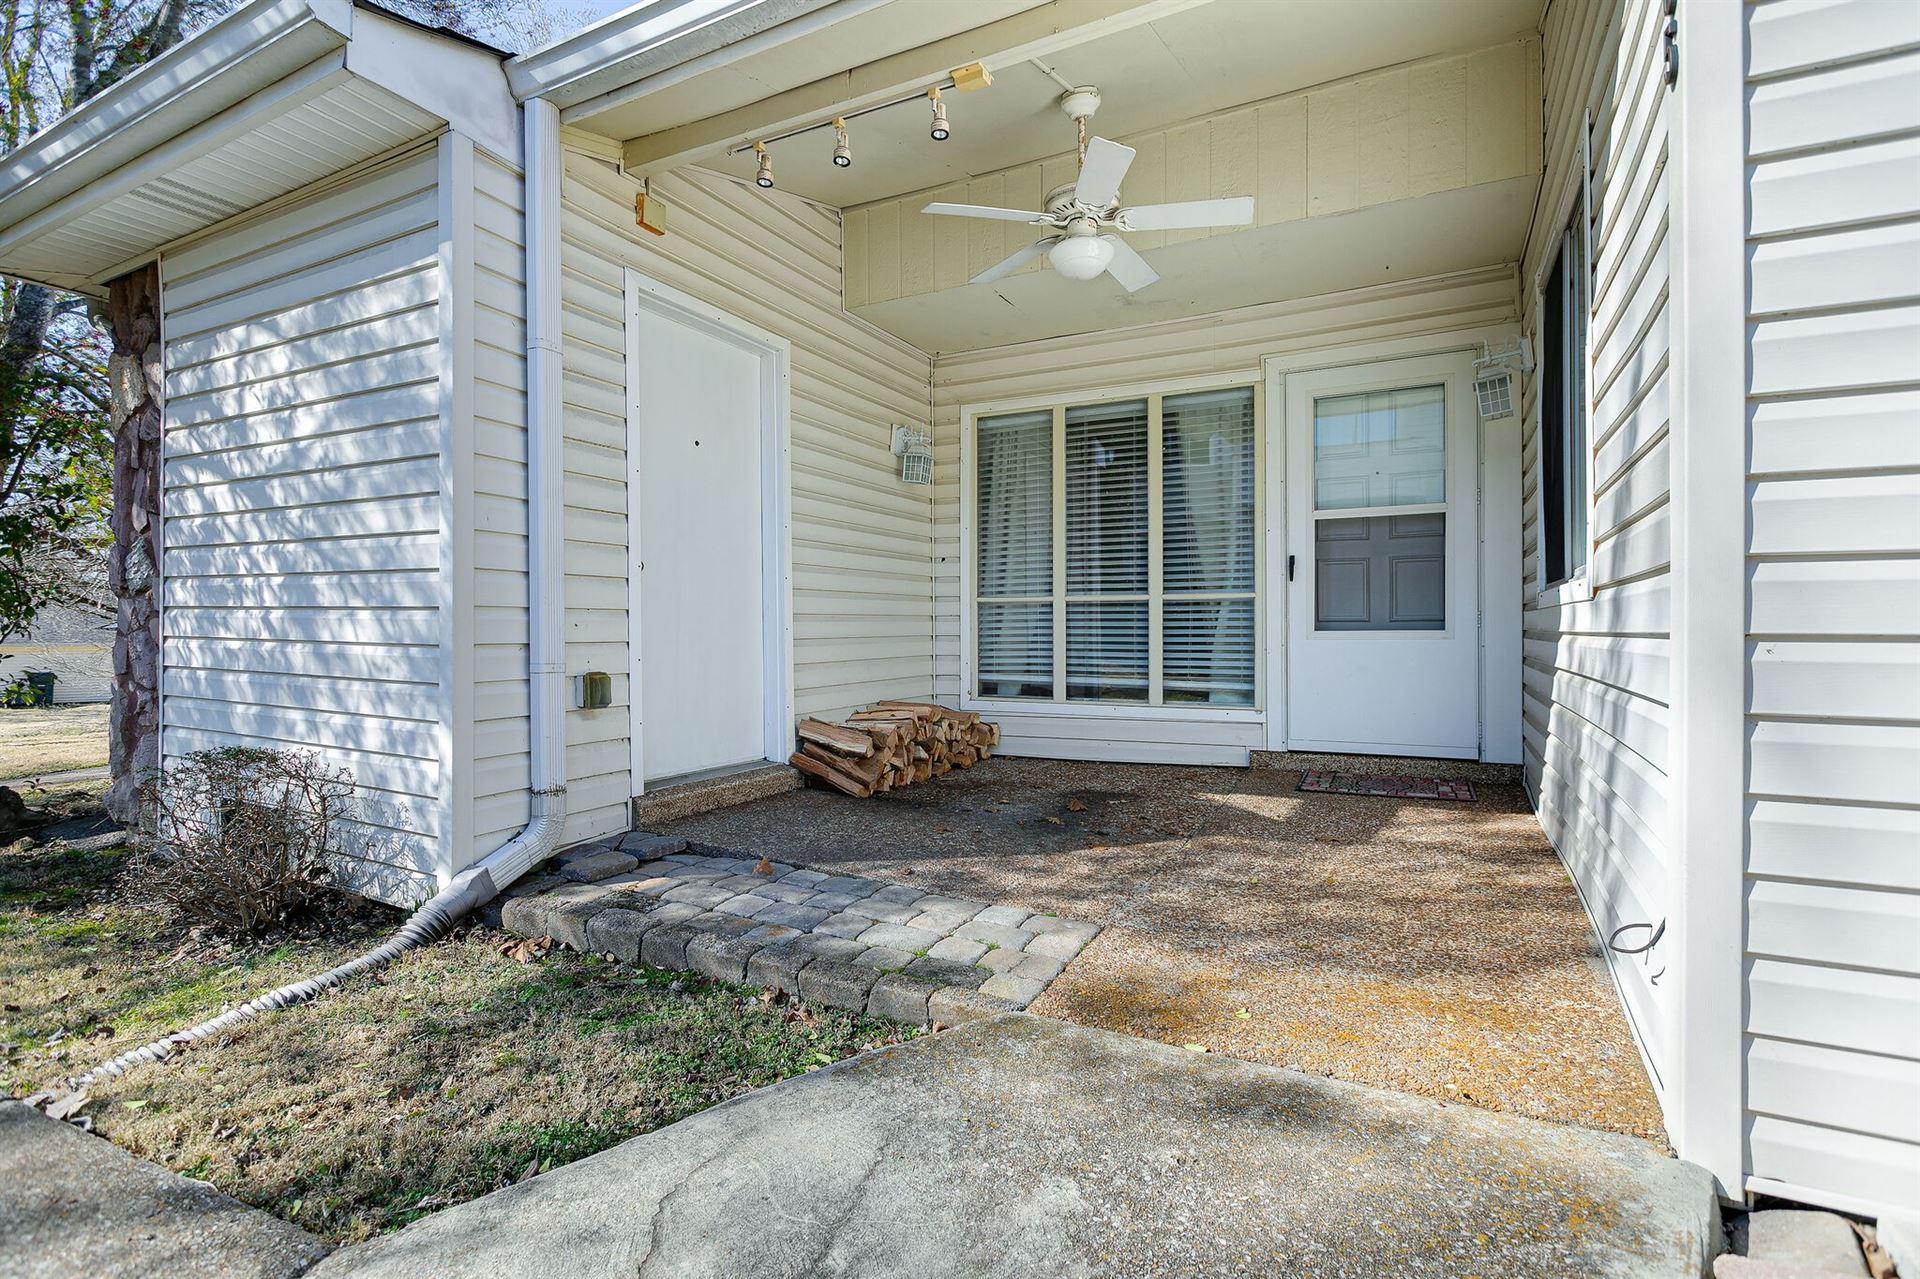 Photo of 810 Bellevue Rd #205, Nashville, TN 37221 (MLS # 2232025)